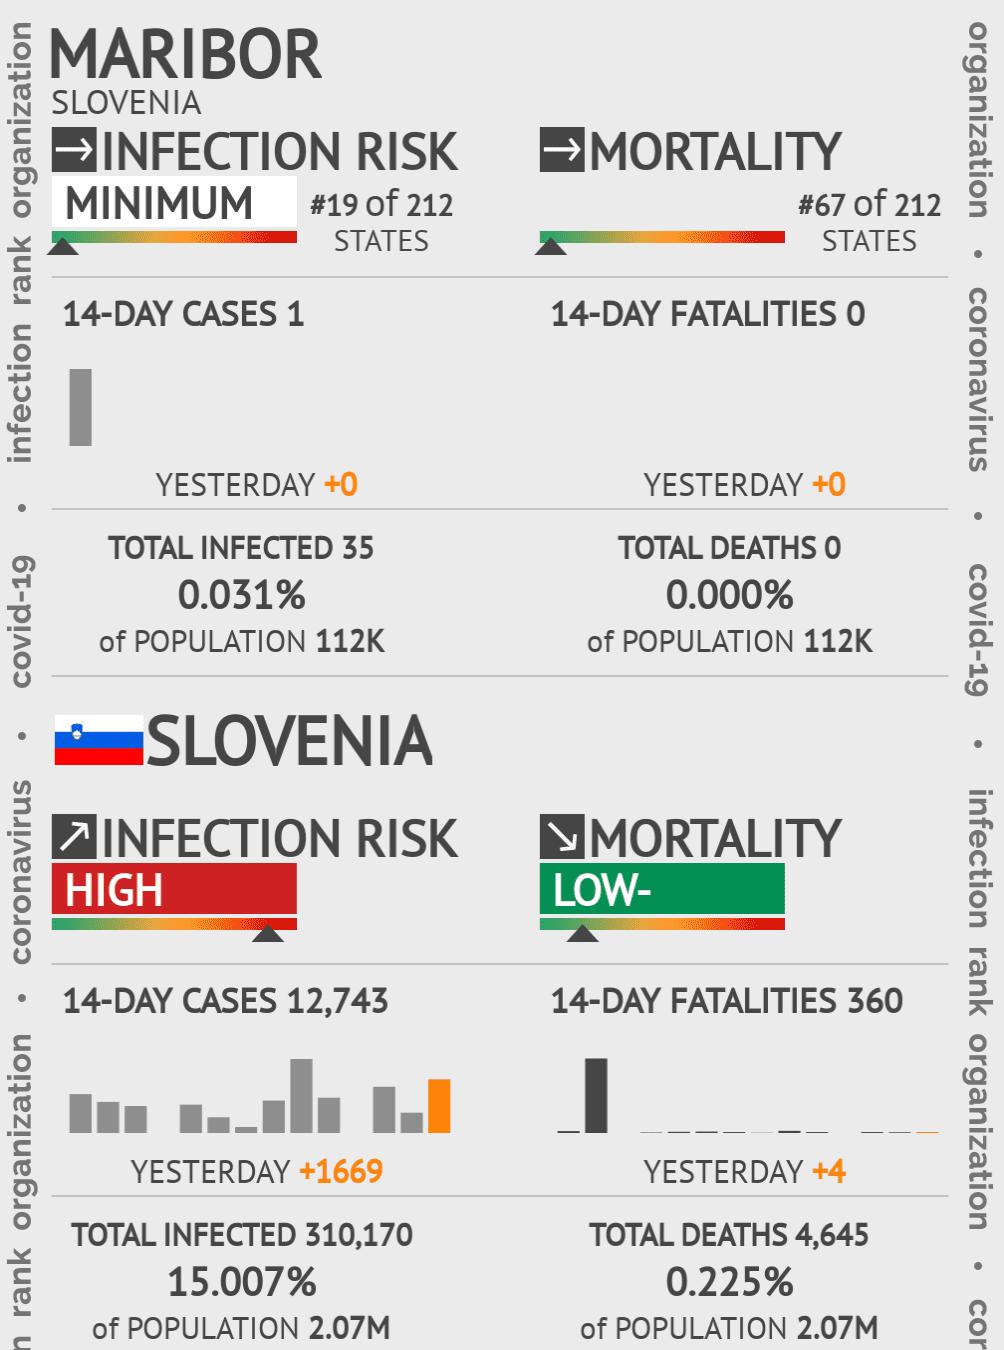 Maribor Coronavirus Covid-19 Risk of Infection on May 14, 2020